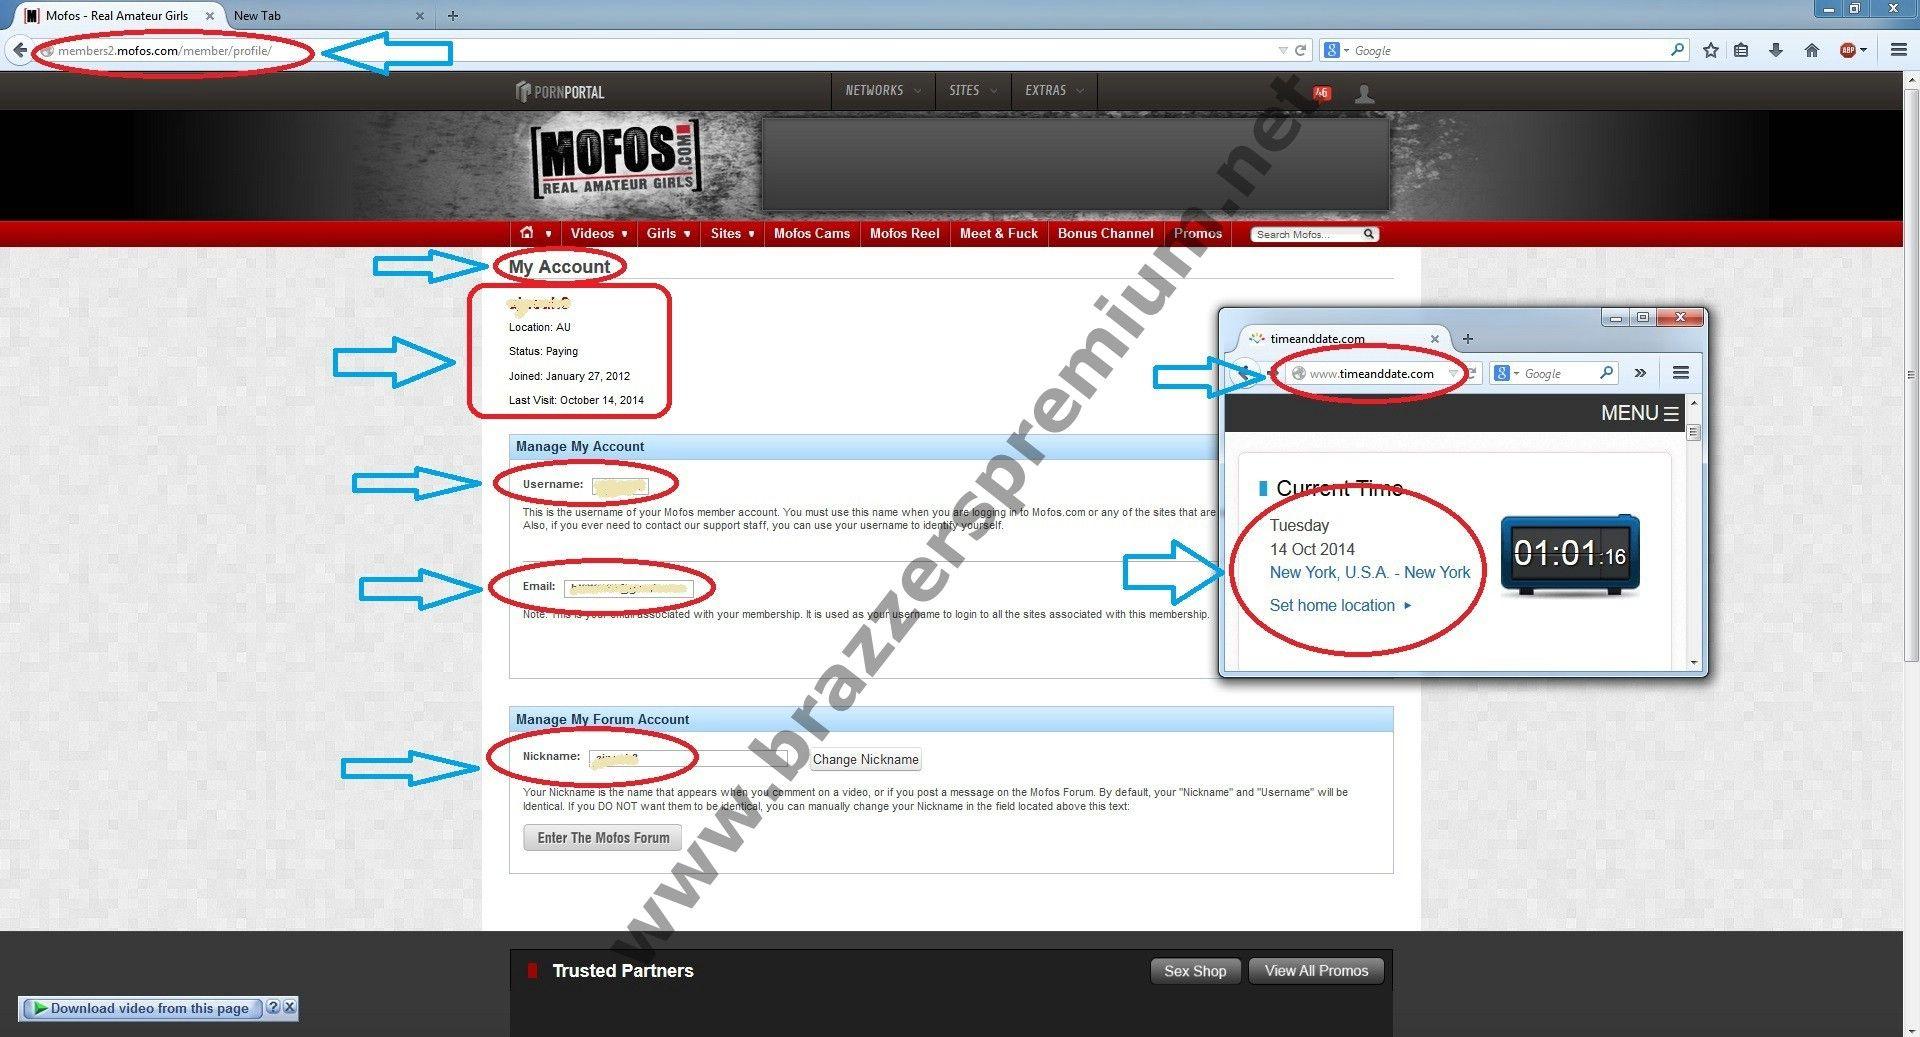 Mofos member account